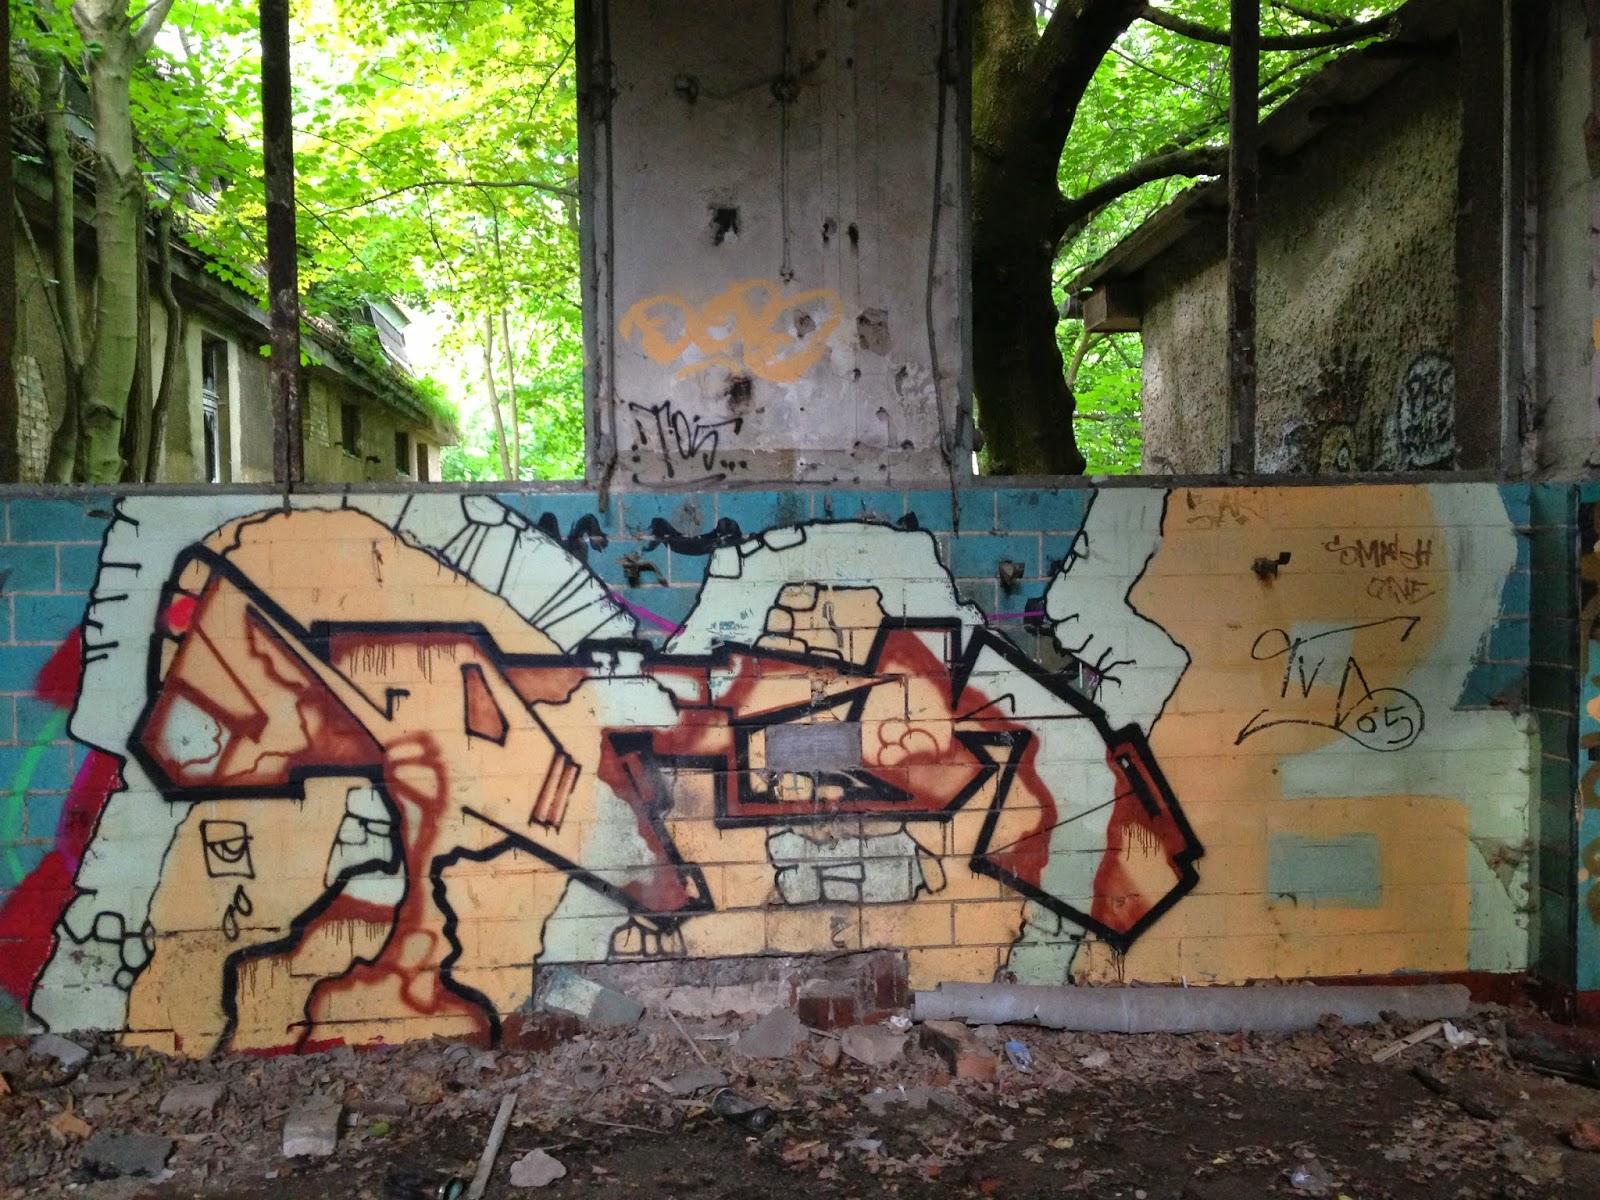 Berlin Street Art verlassene Klink Kinderkrankenhaus Weissensee verlassen Kunst Monster Geist